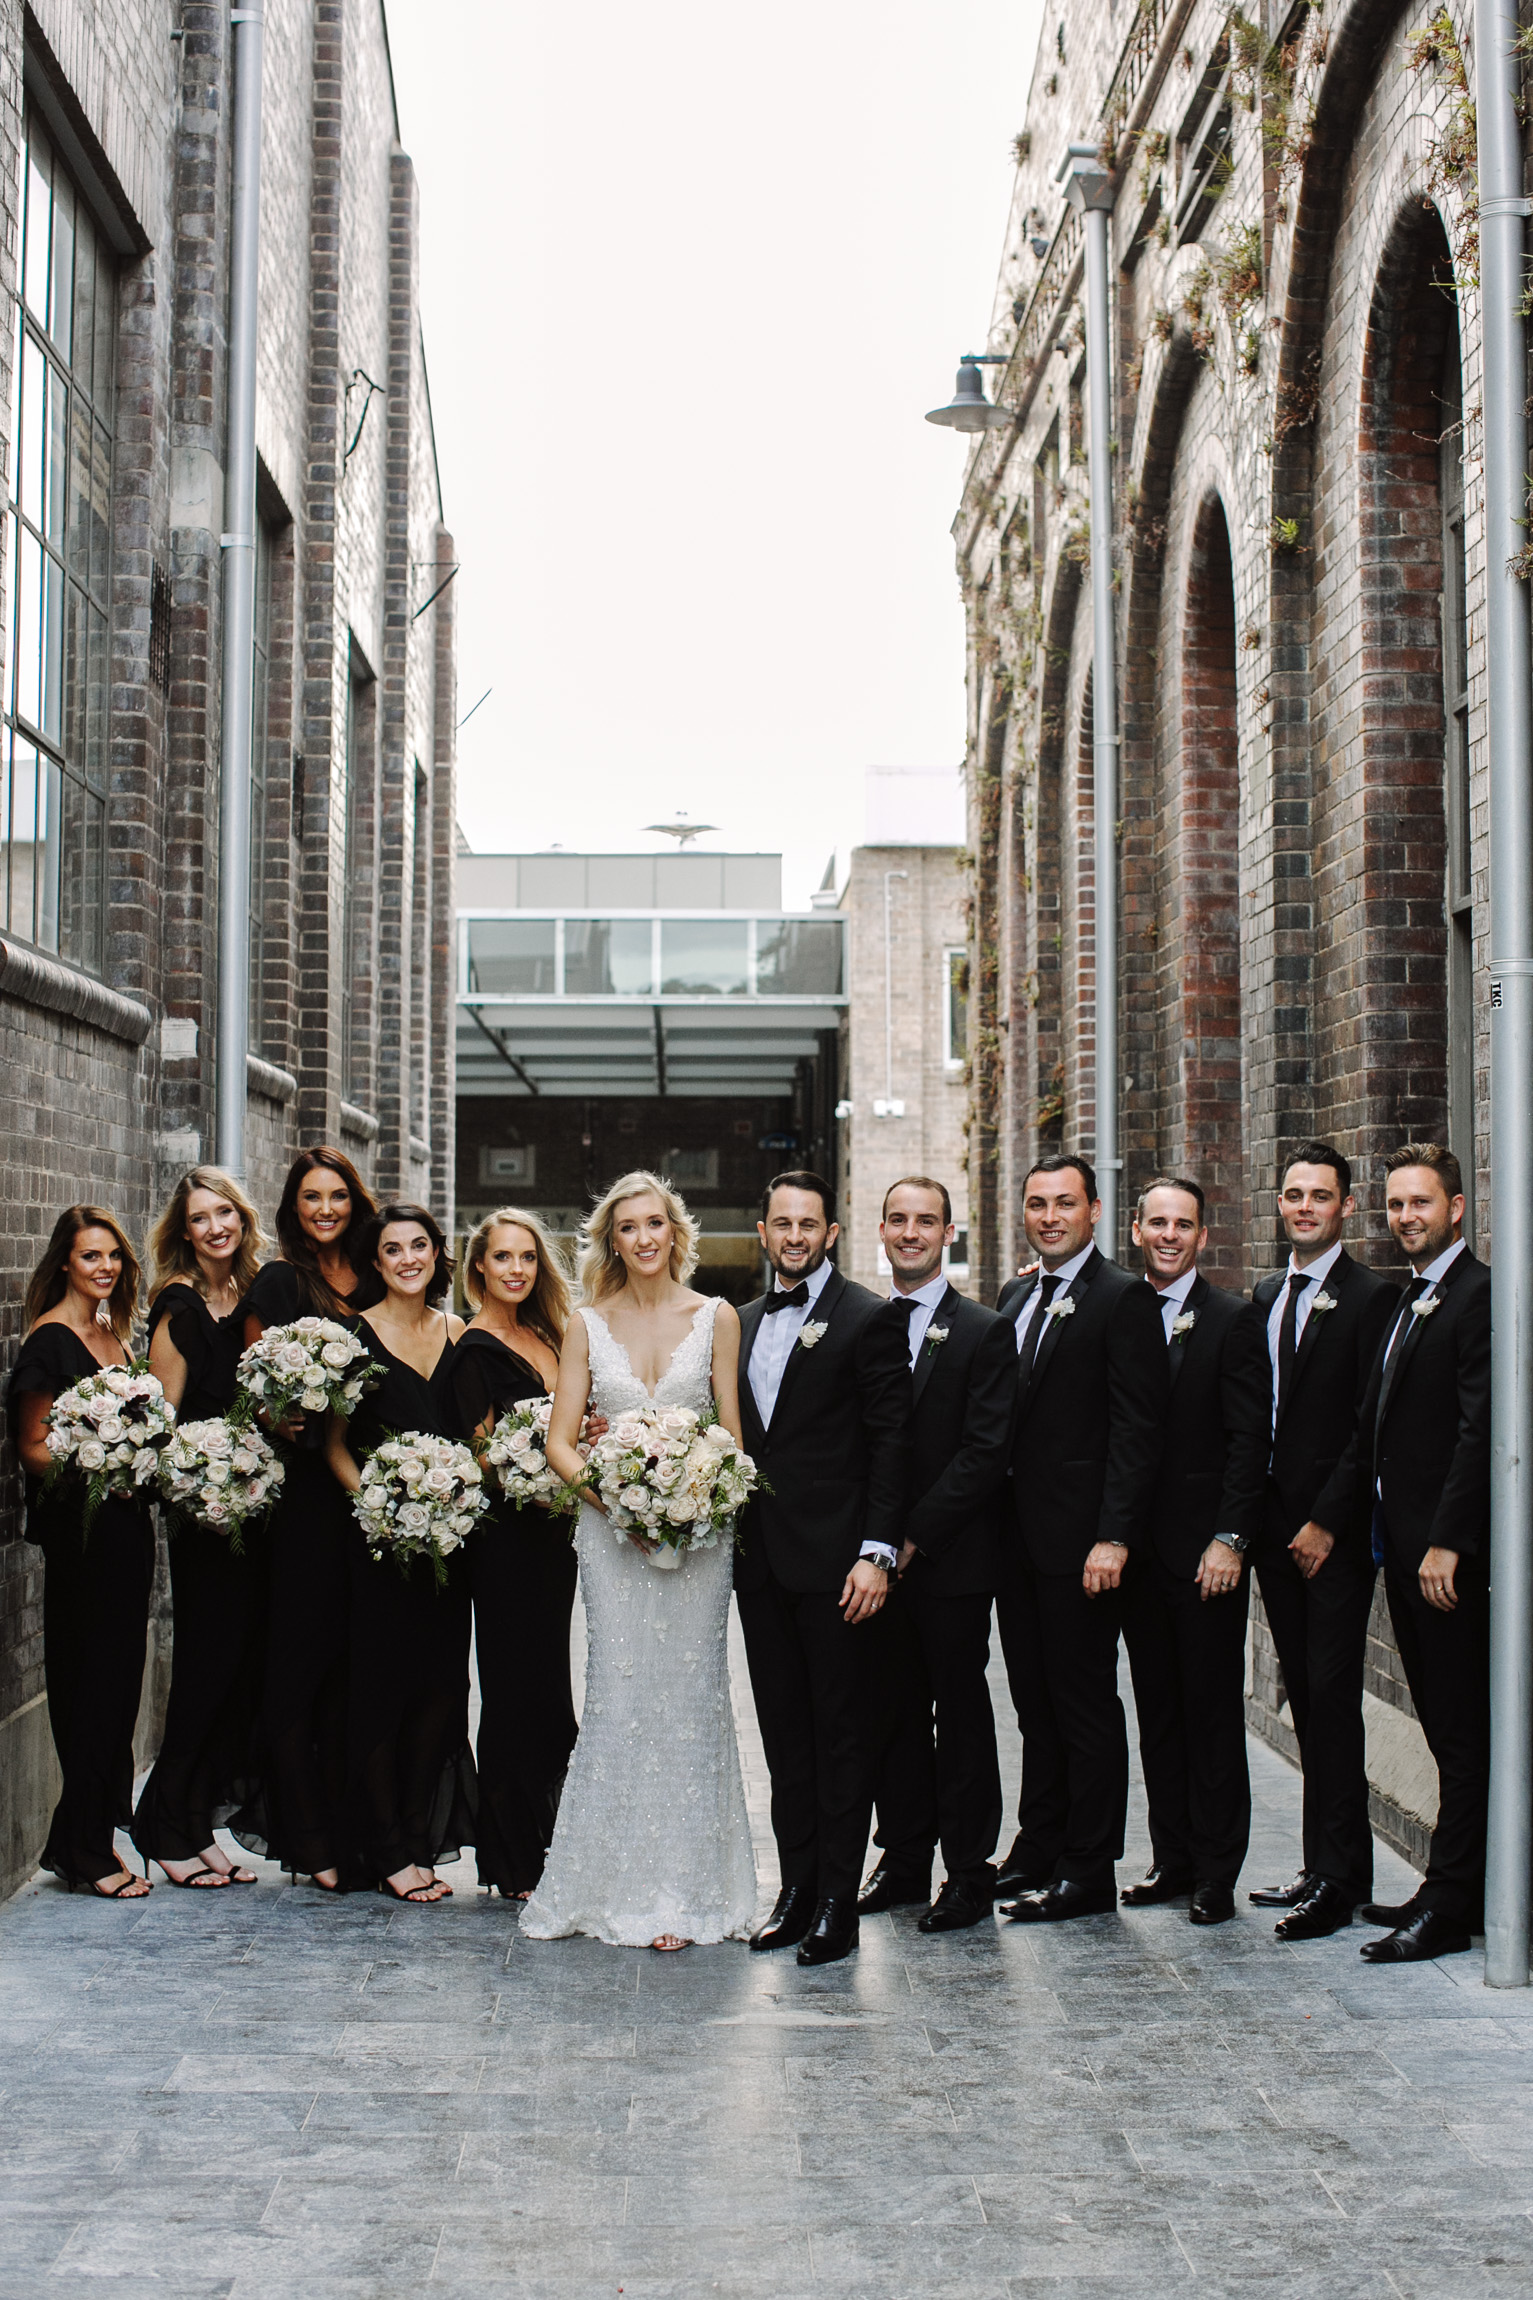 180223_justinaaron_wedding_charlotte_david_h-164.jpg